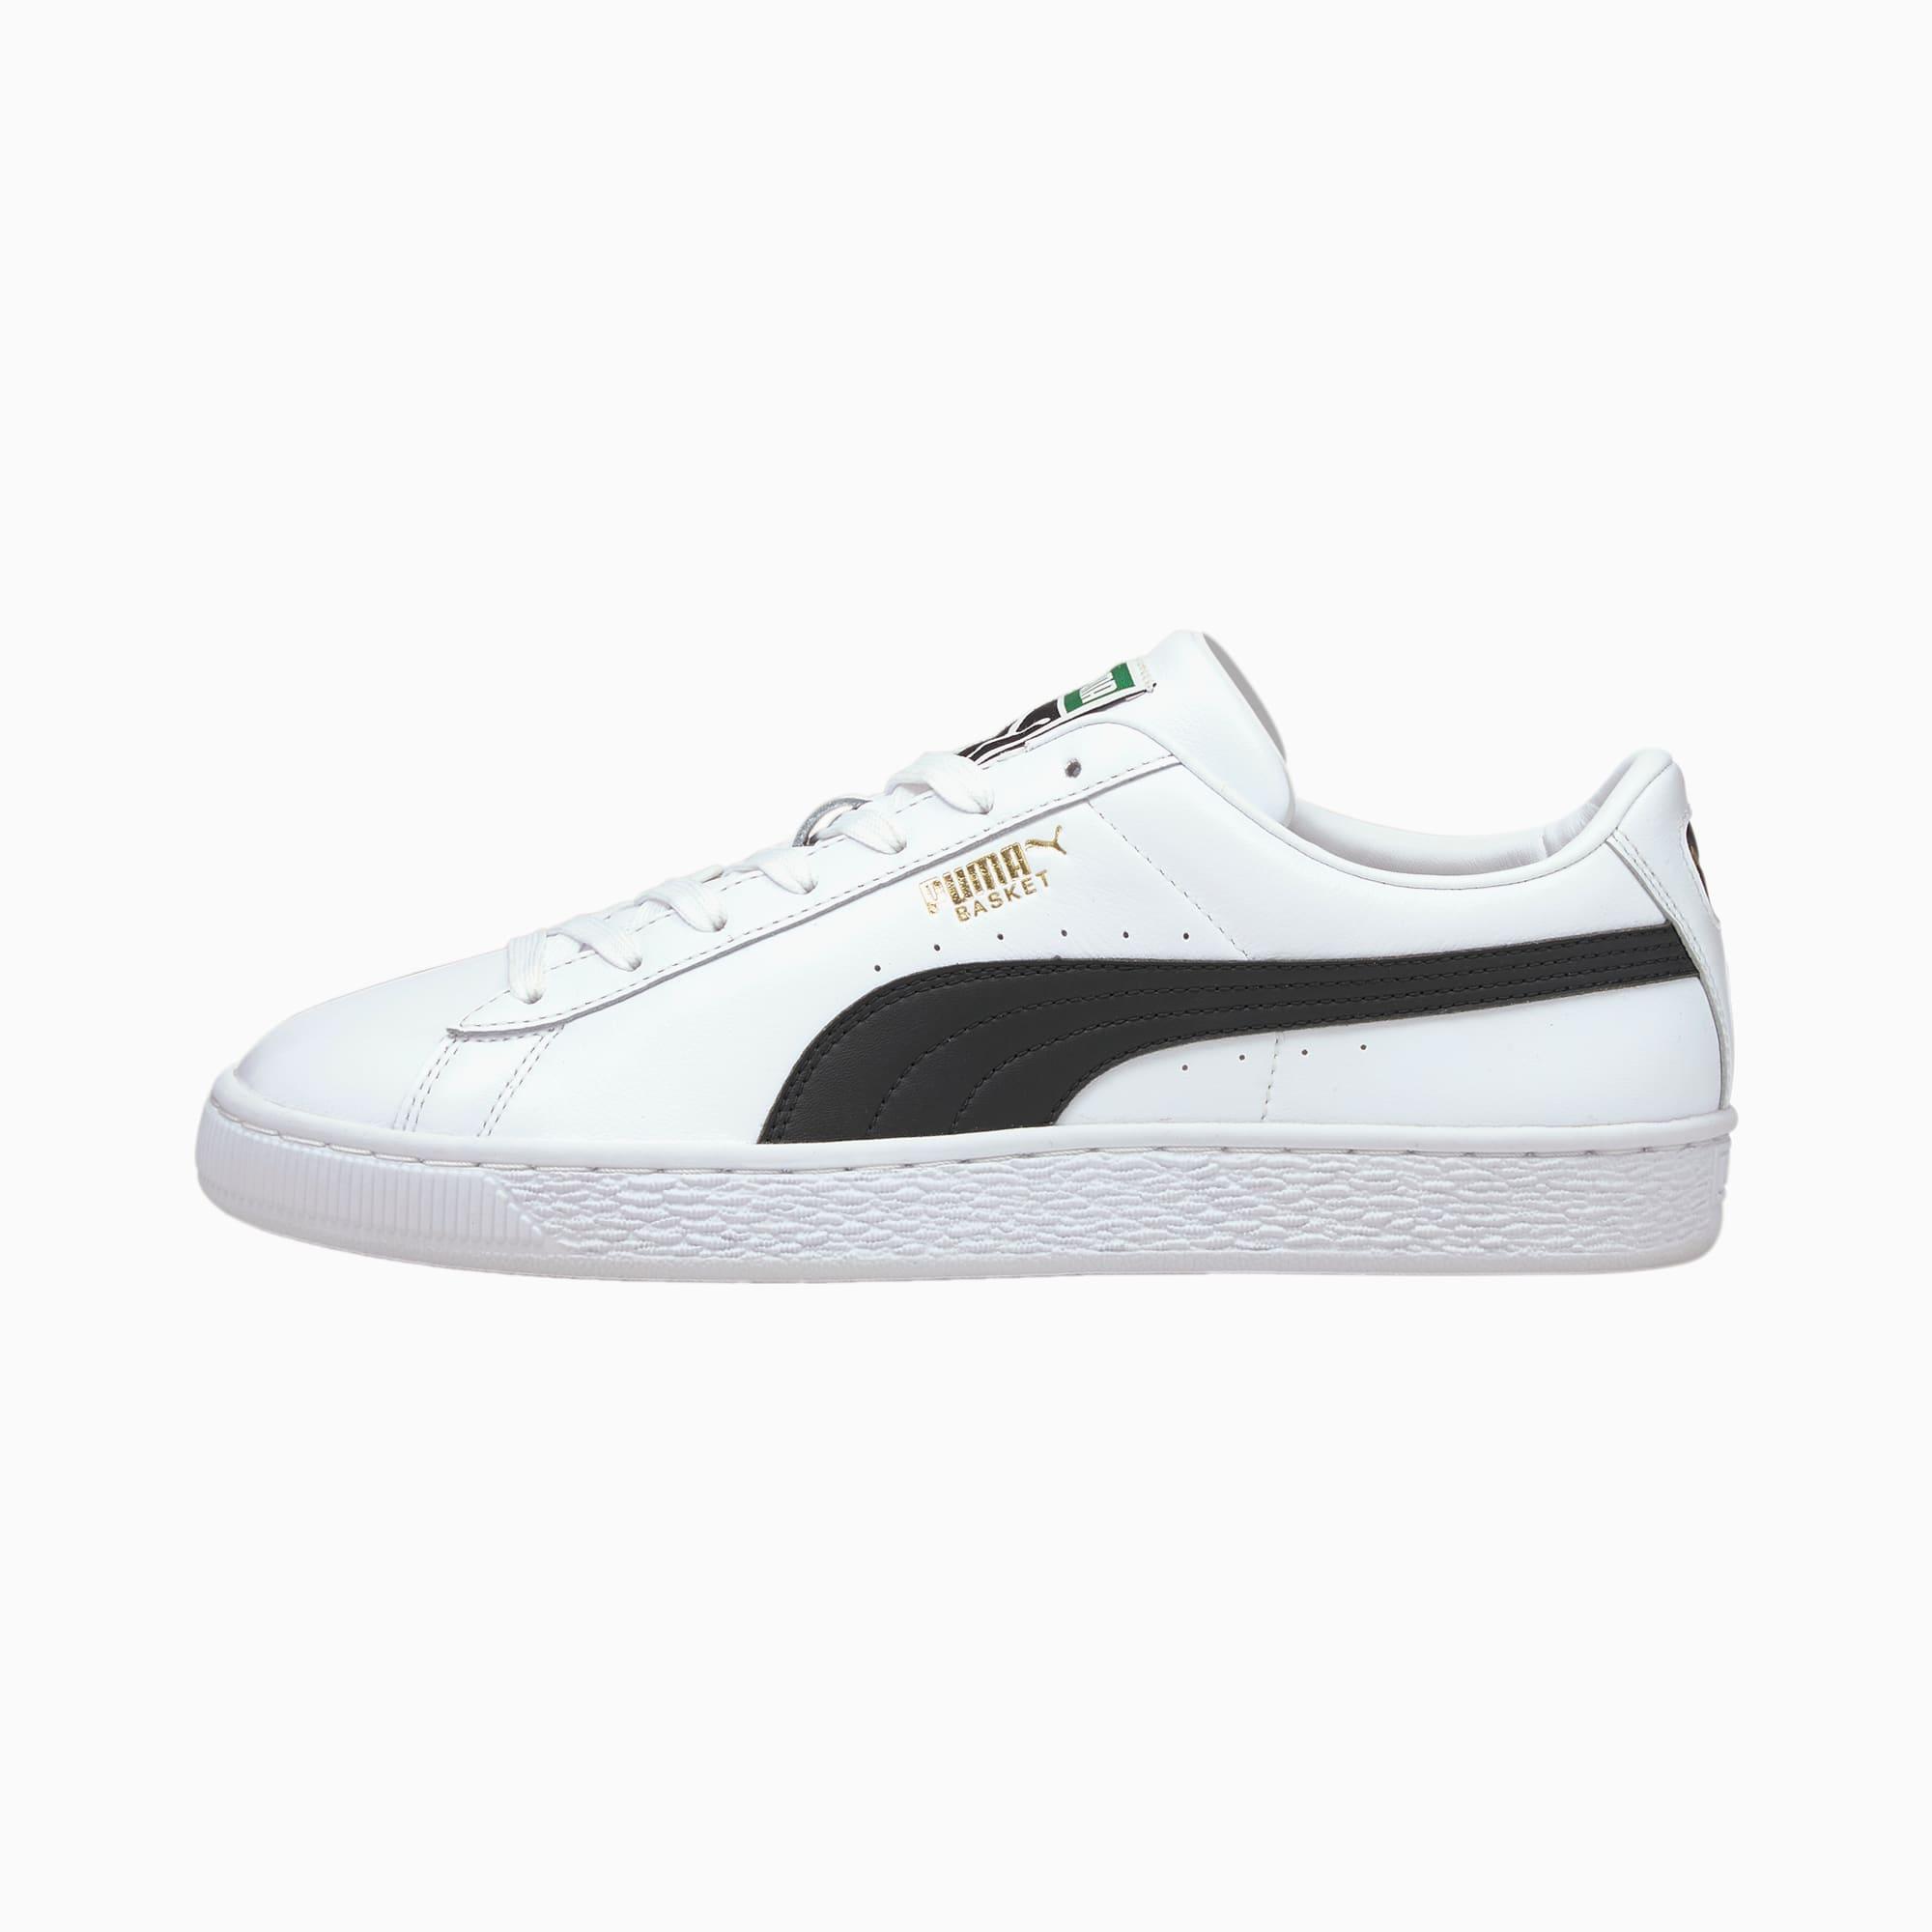 PUMA Basket Classic XXI Sneakers , Wit/Zwart/Aucun, Maat 40,5